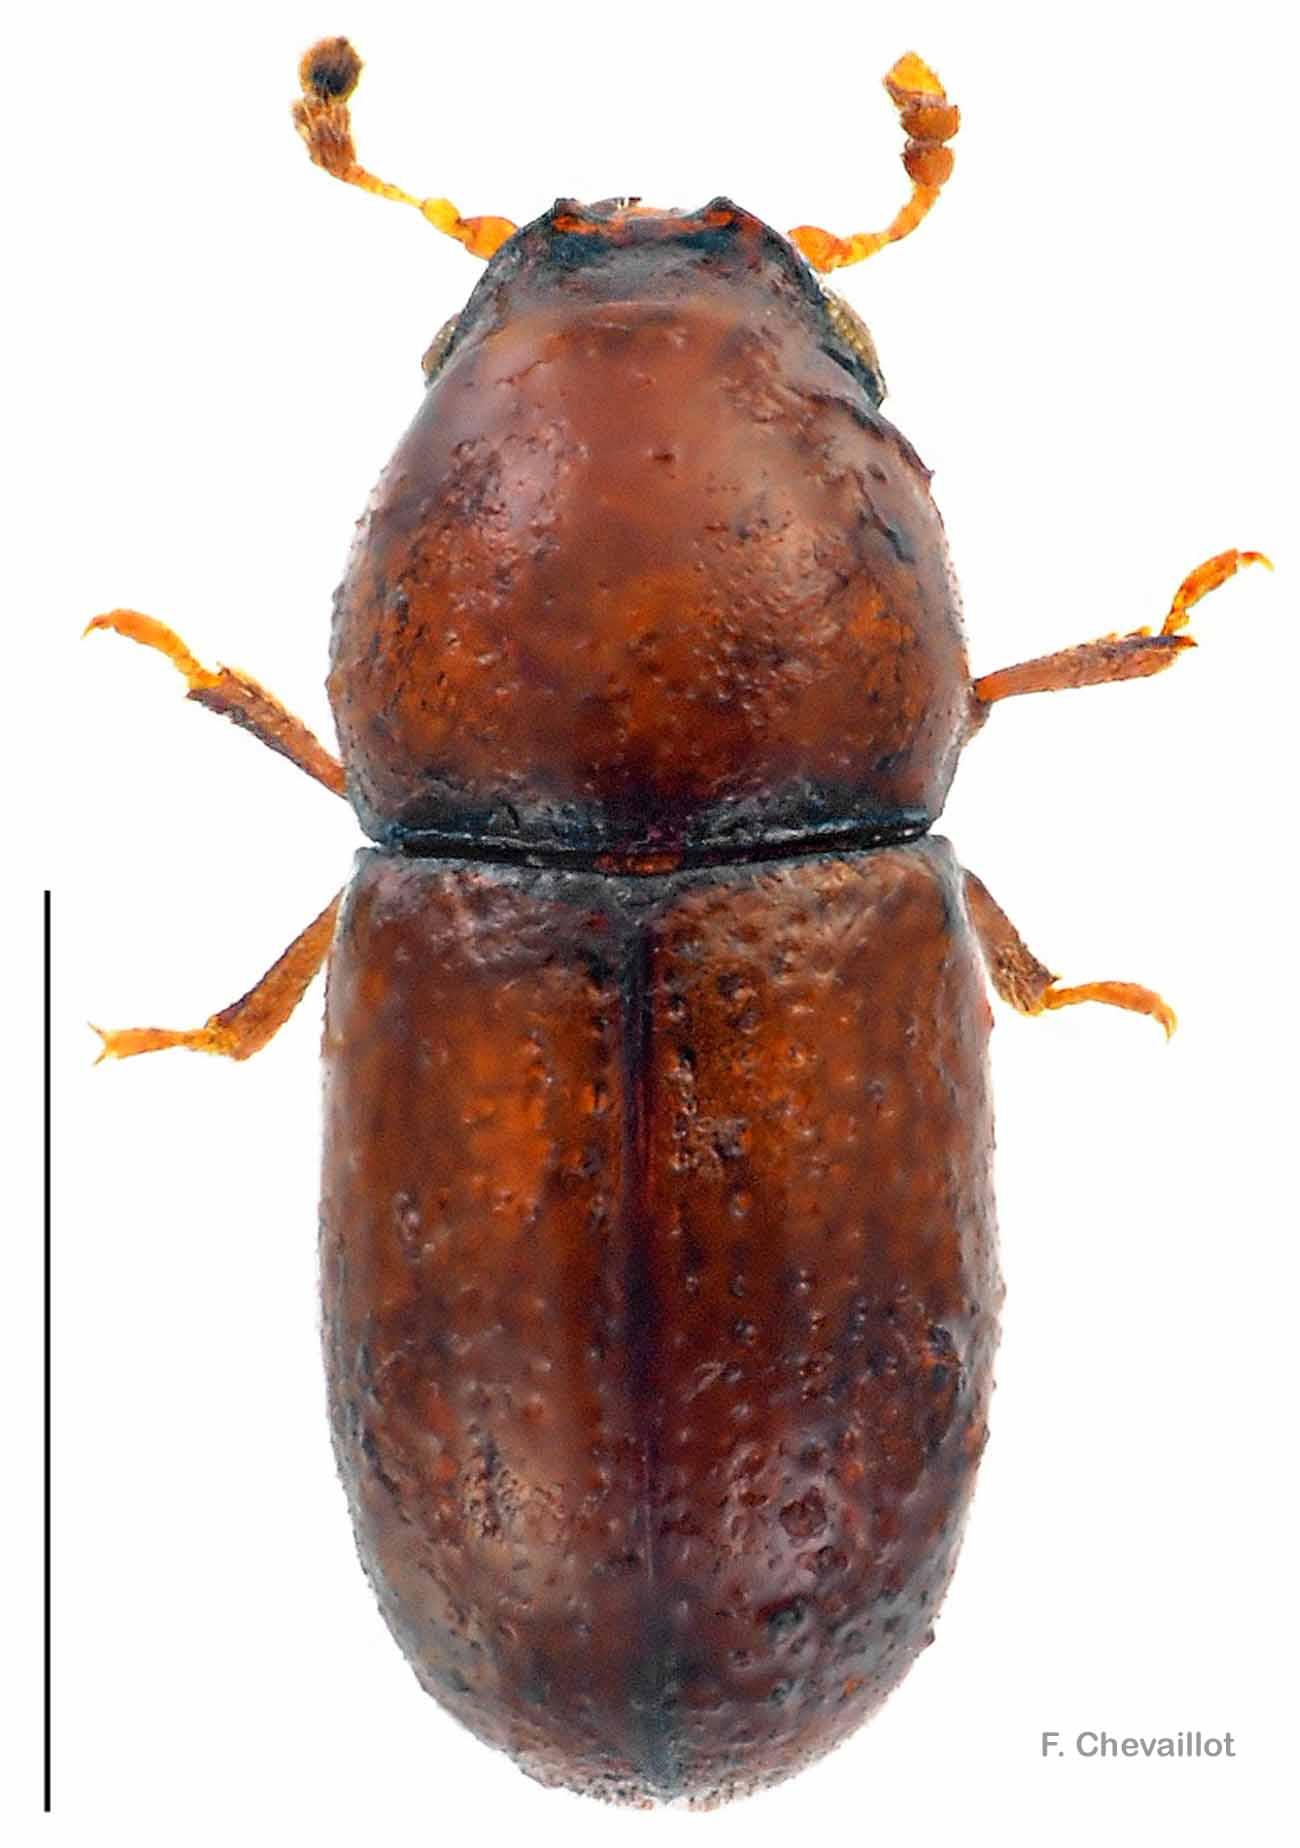 Cis lineatocribratus